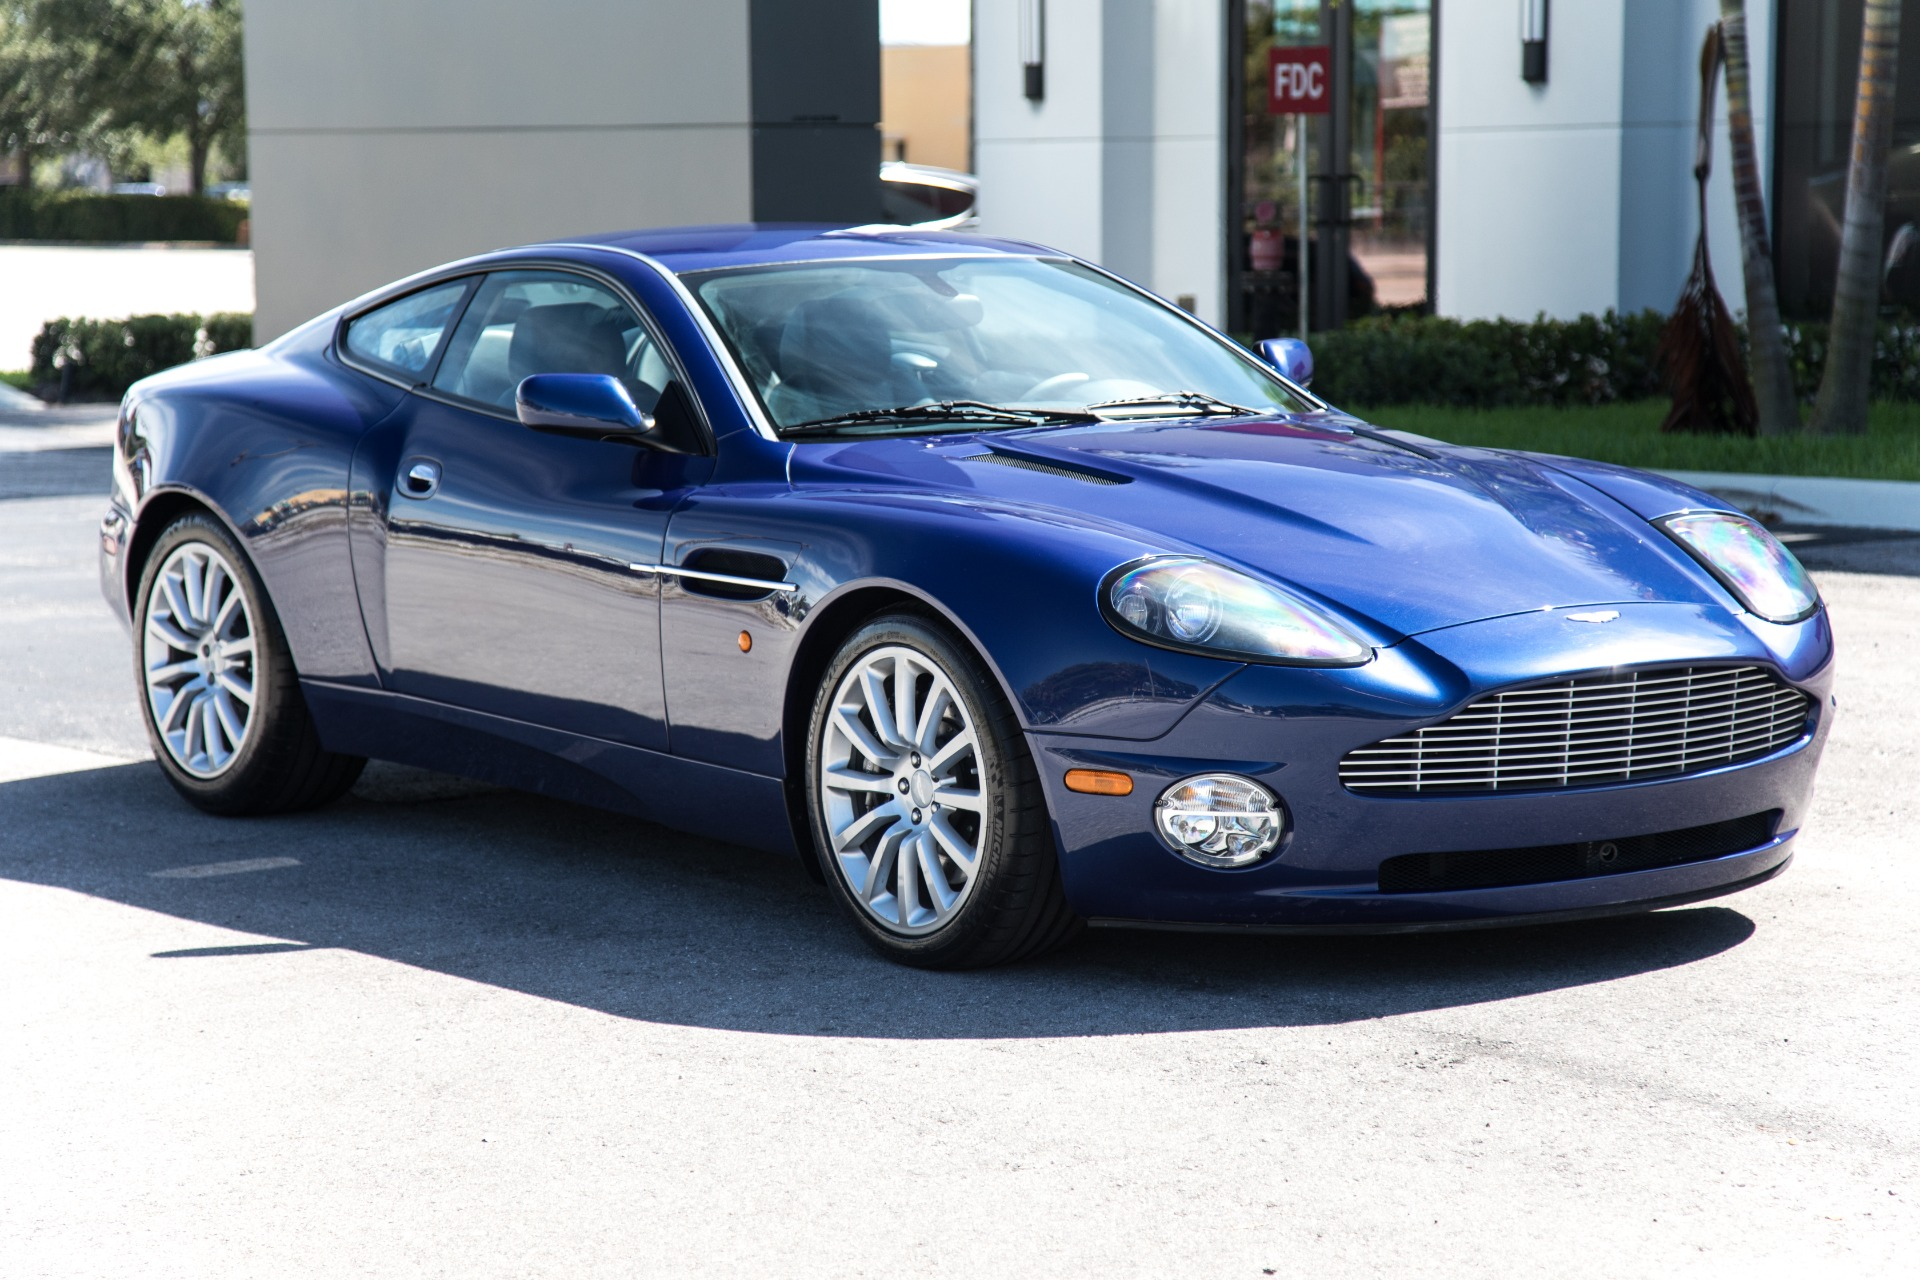 Used 2002 Aston Martin V12 Vanquish For Sale 74 900 Marino Performance Motors Stock 500159